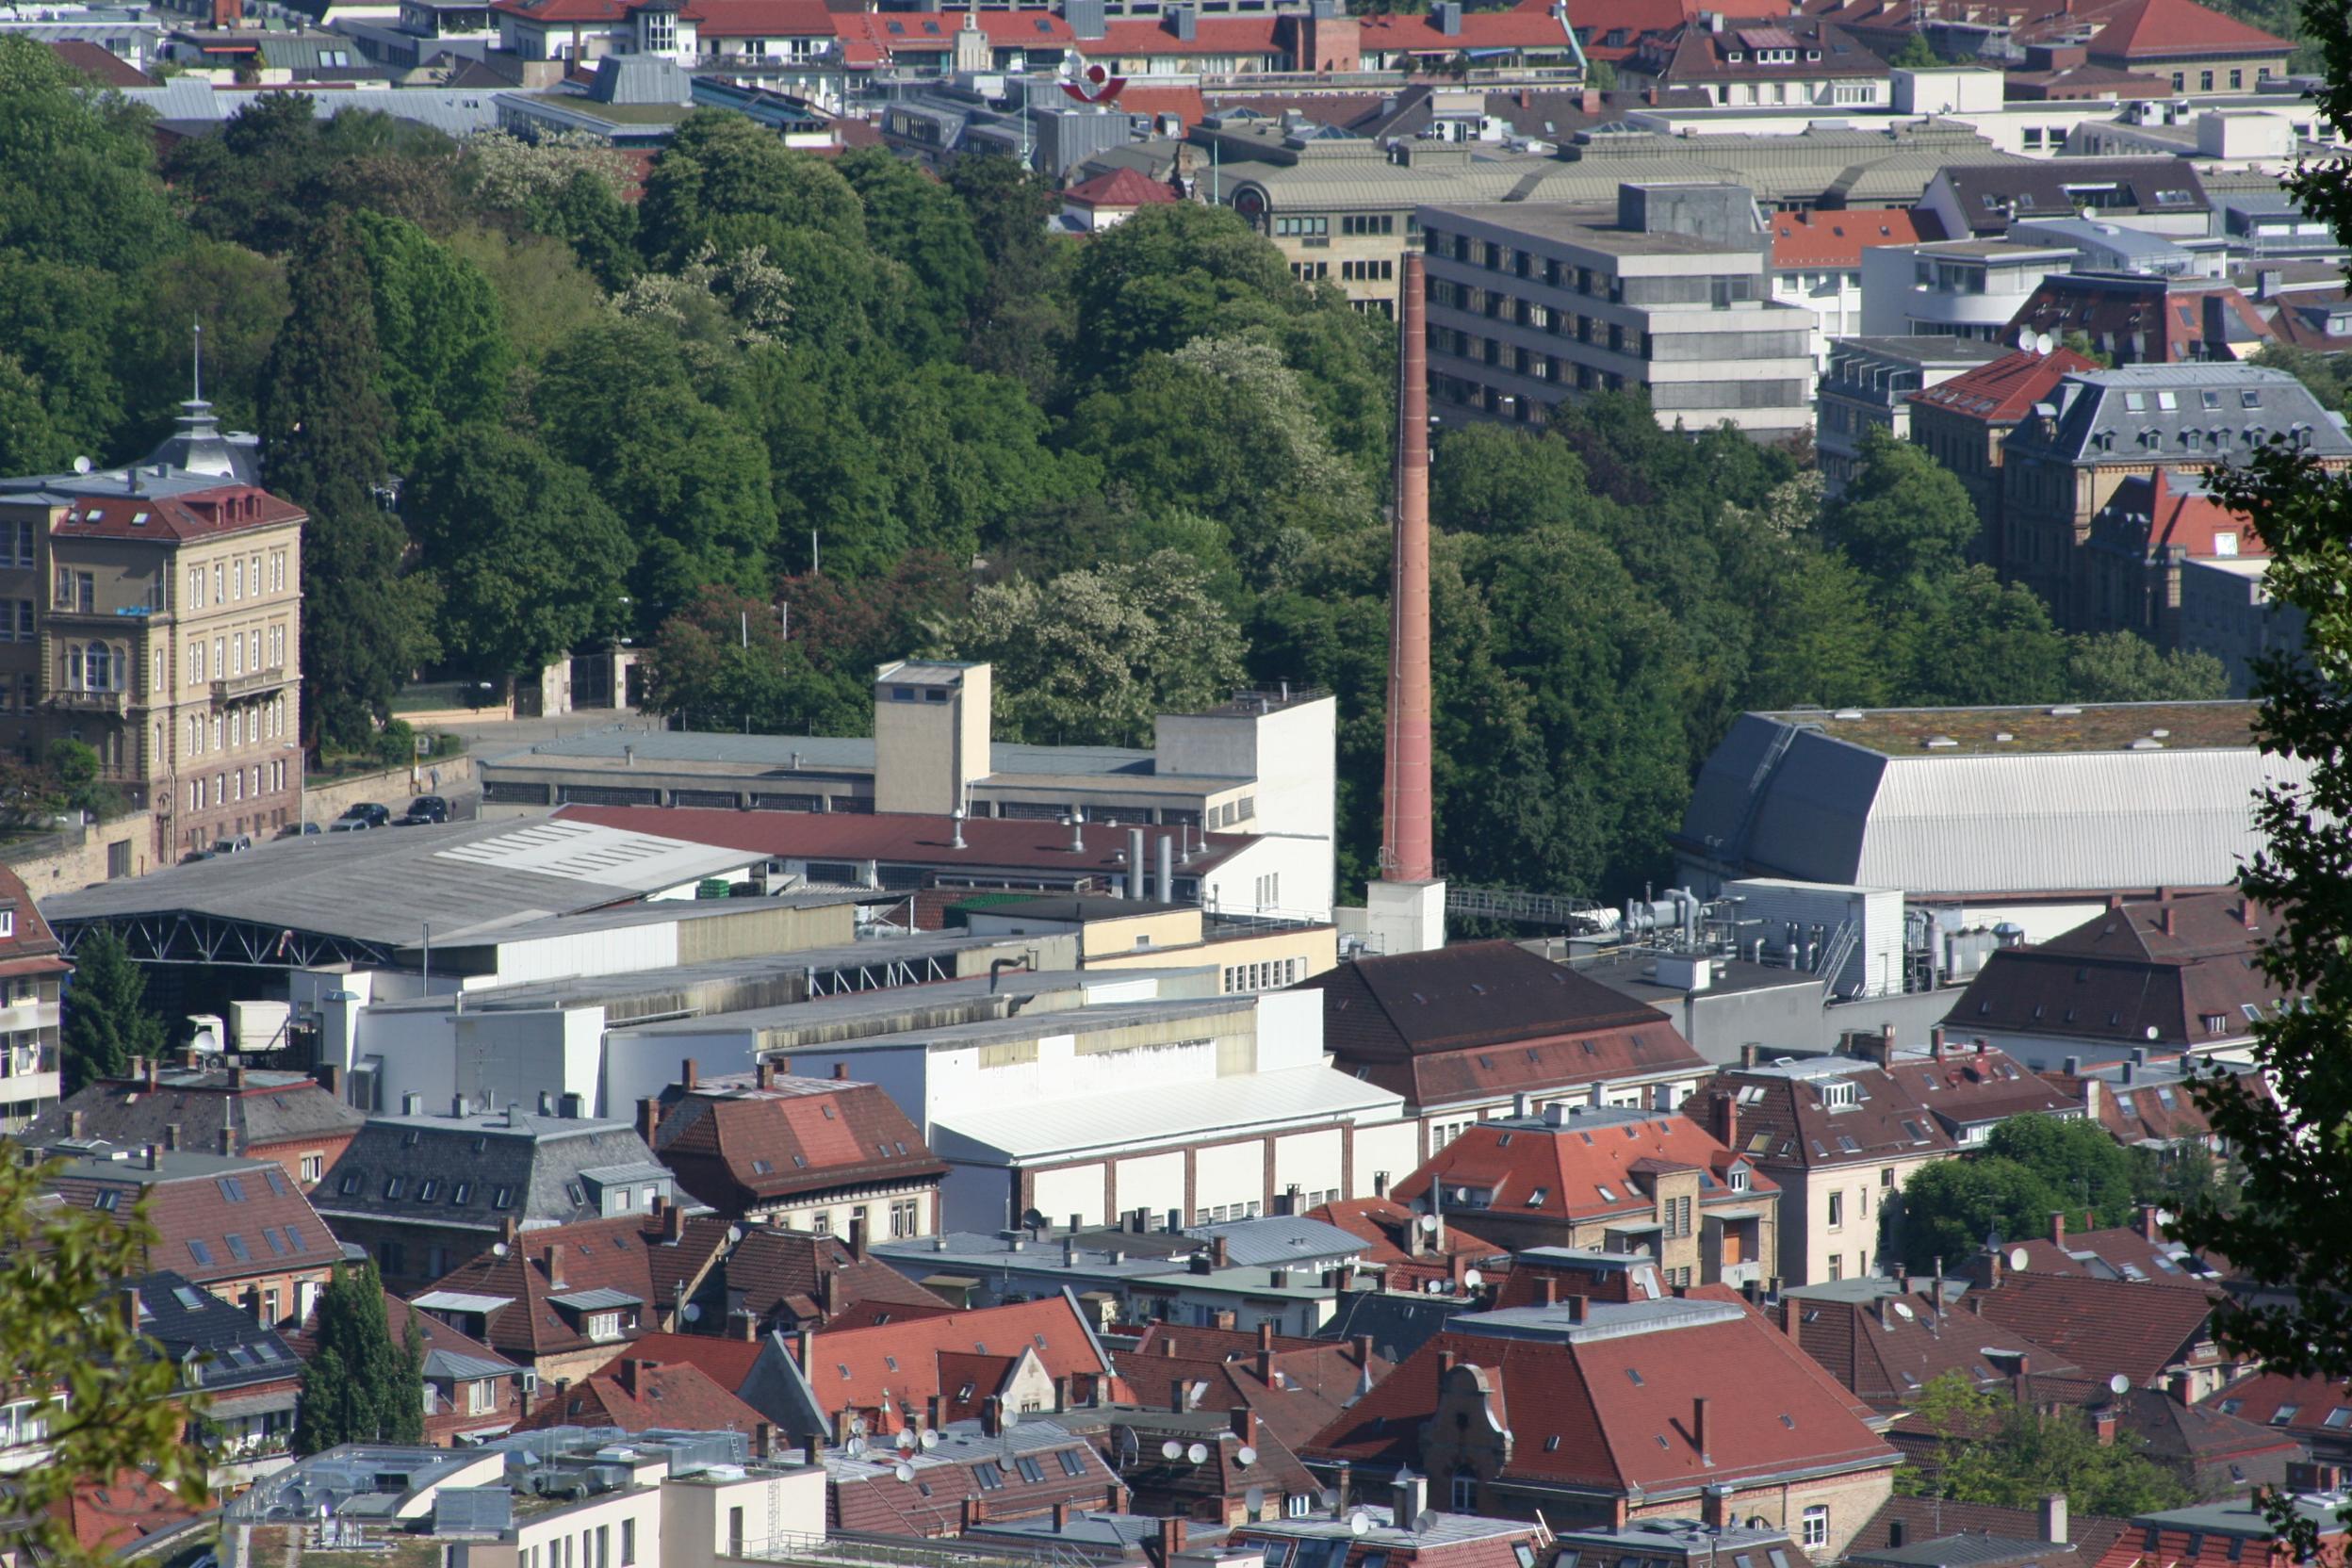 Kaminbauer Stuttgart kaminbauer stuttgart hausdesign pro